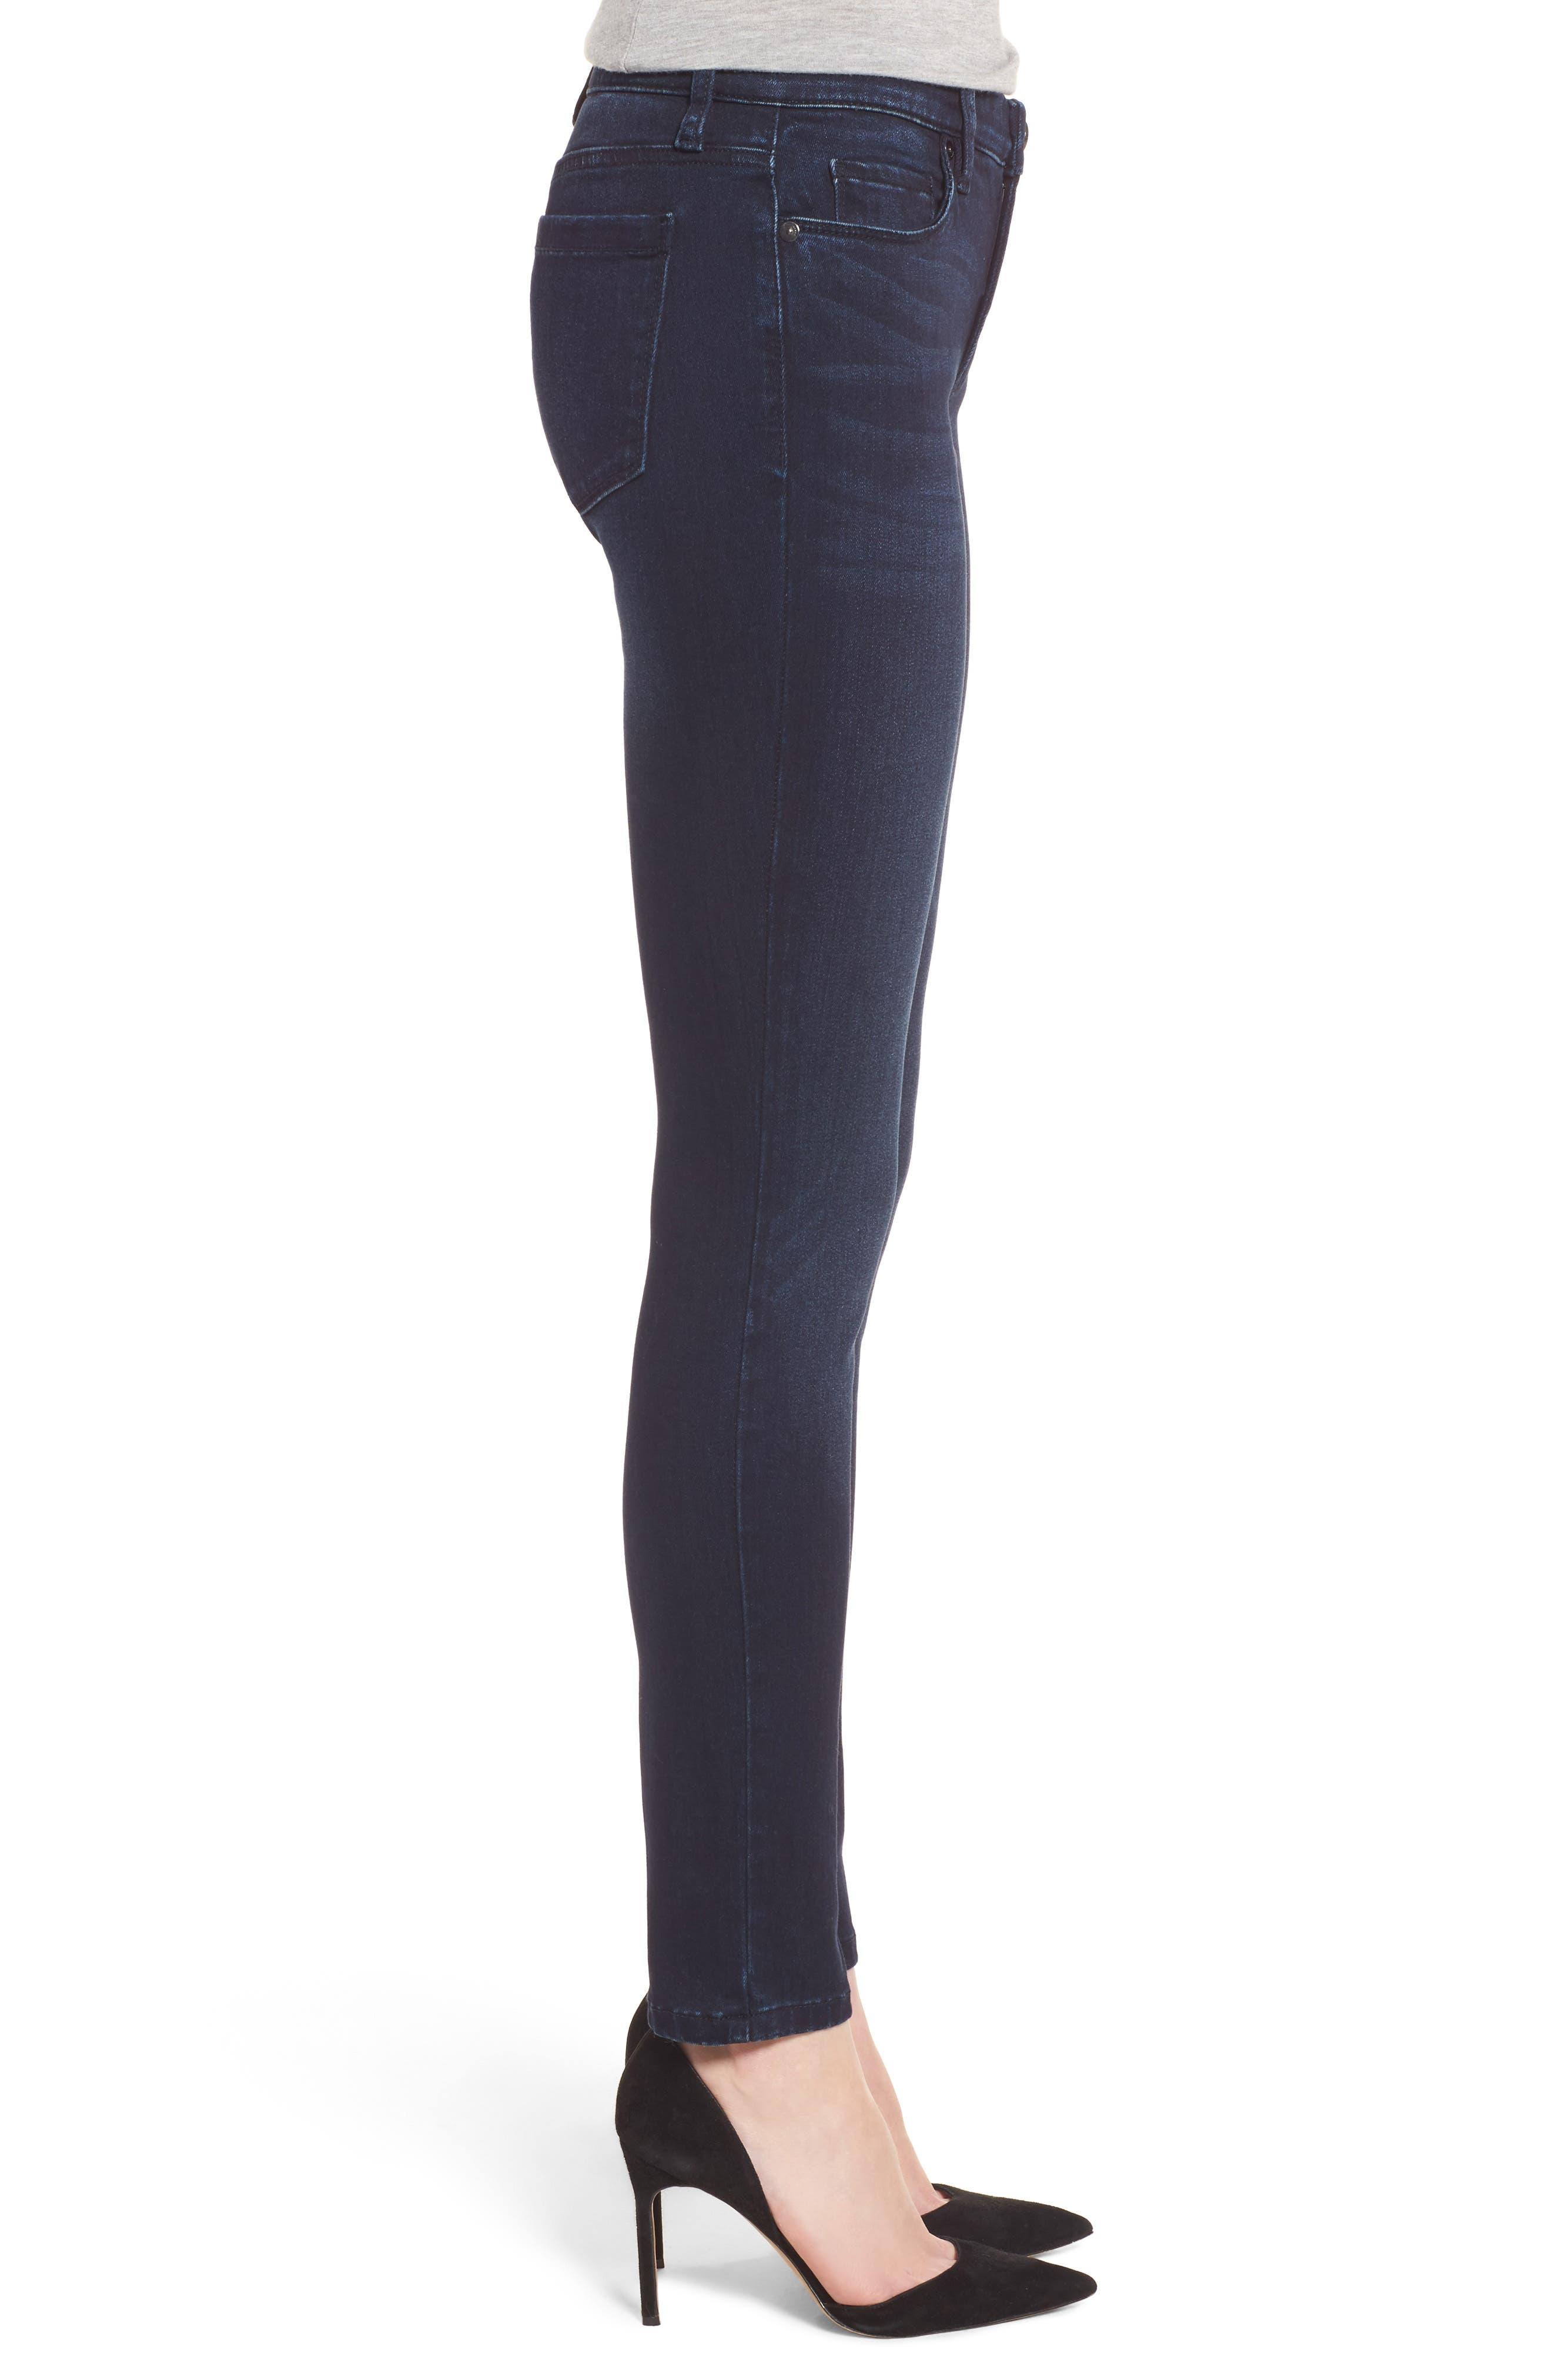 Alternate Image 3  - BLANKNYC Stretch Skinny Jeans (Junk Brain)